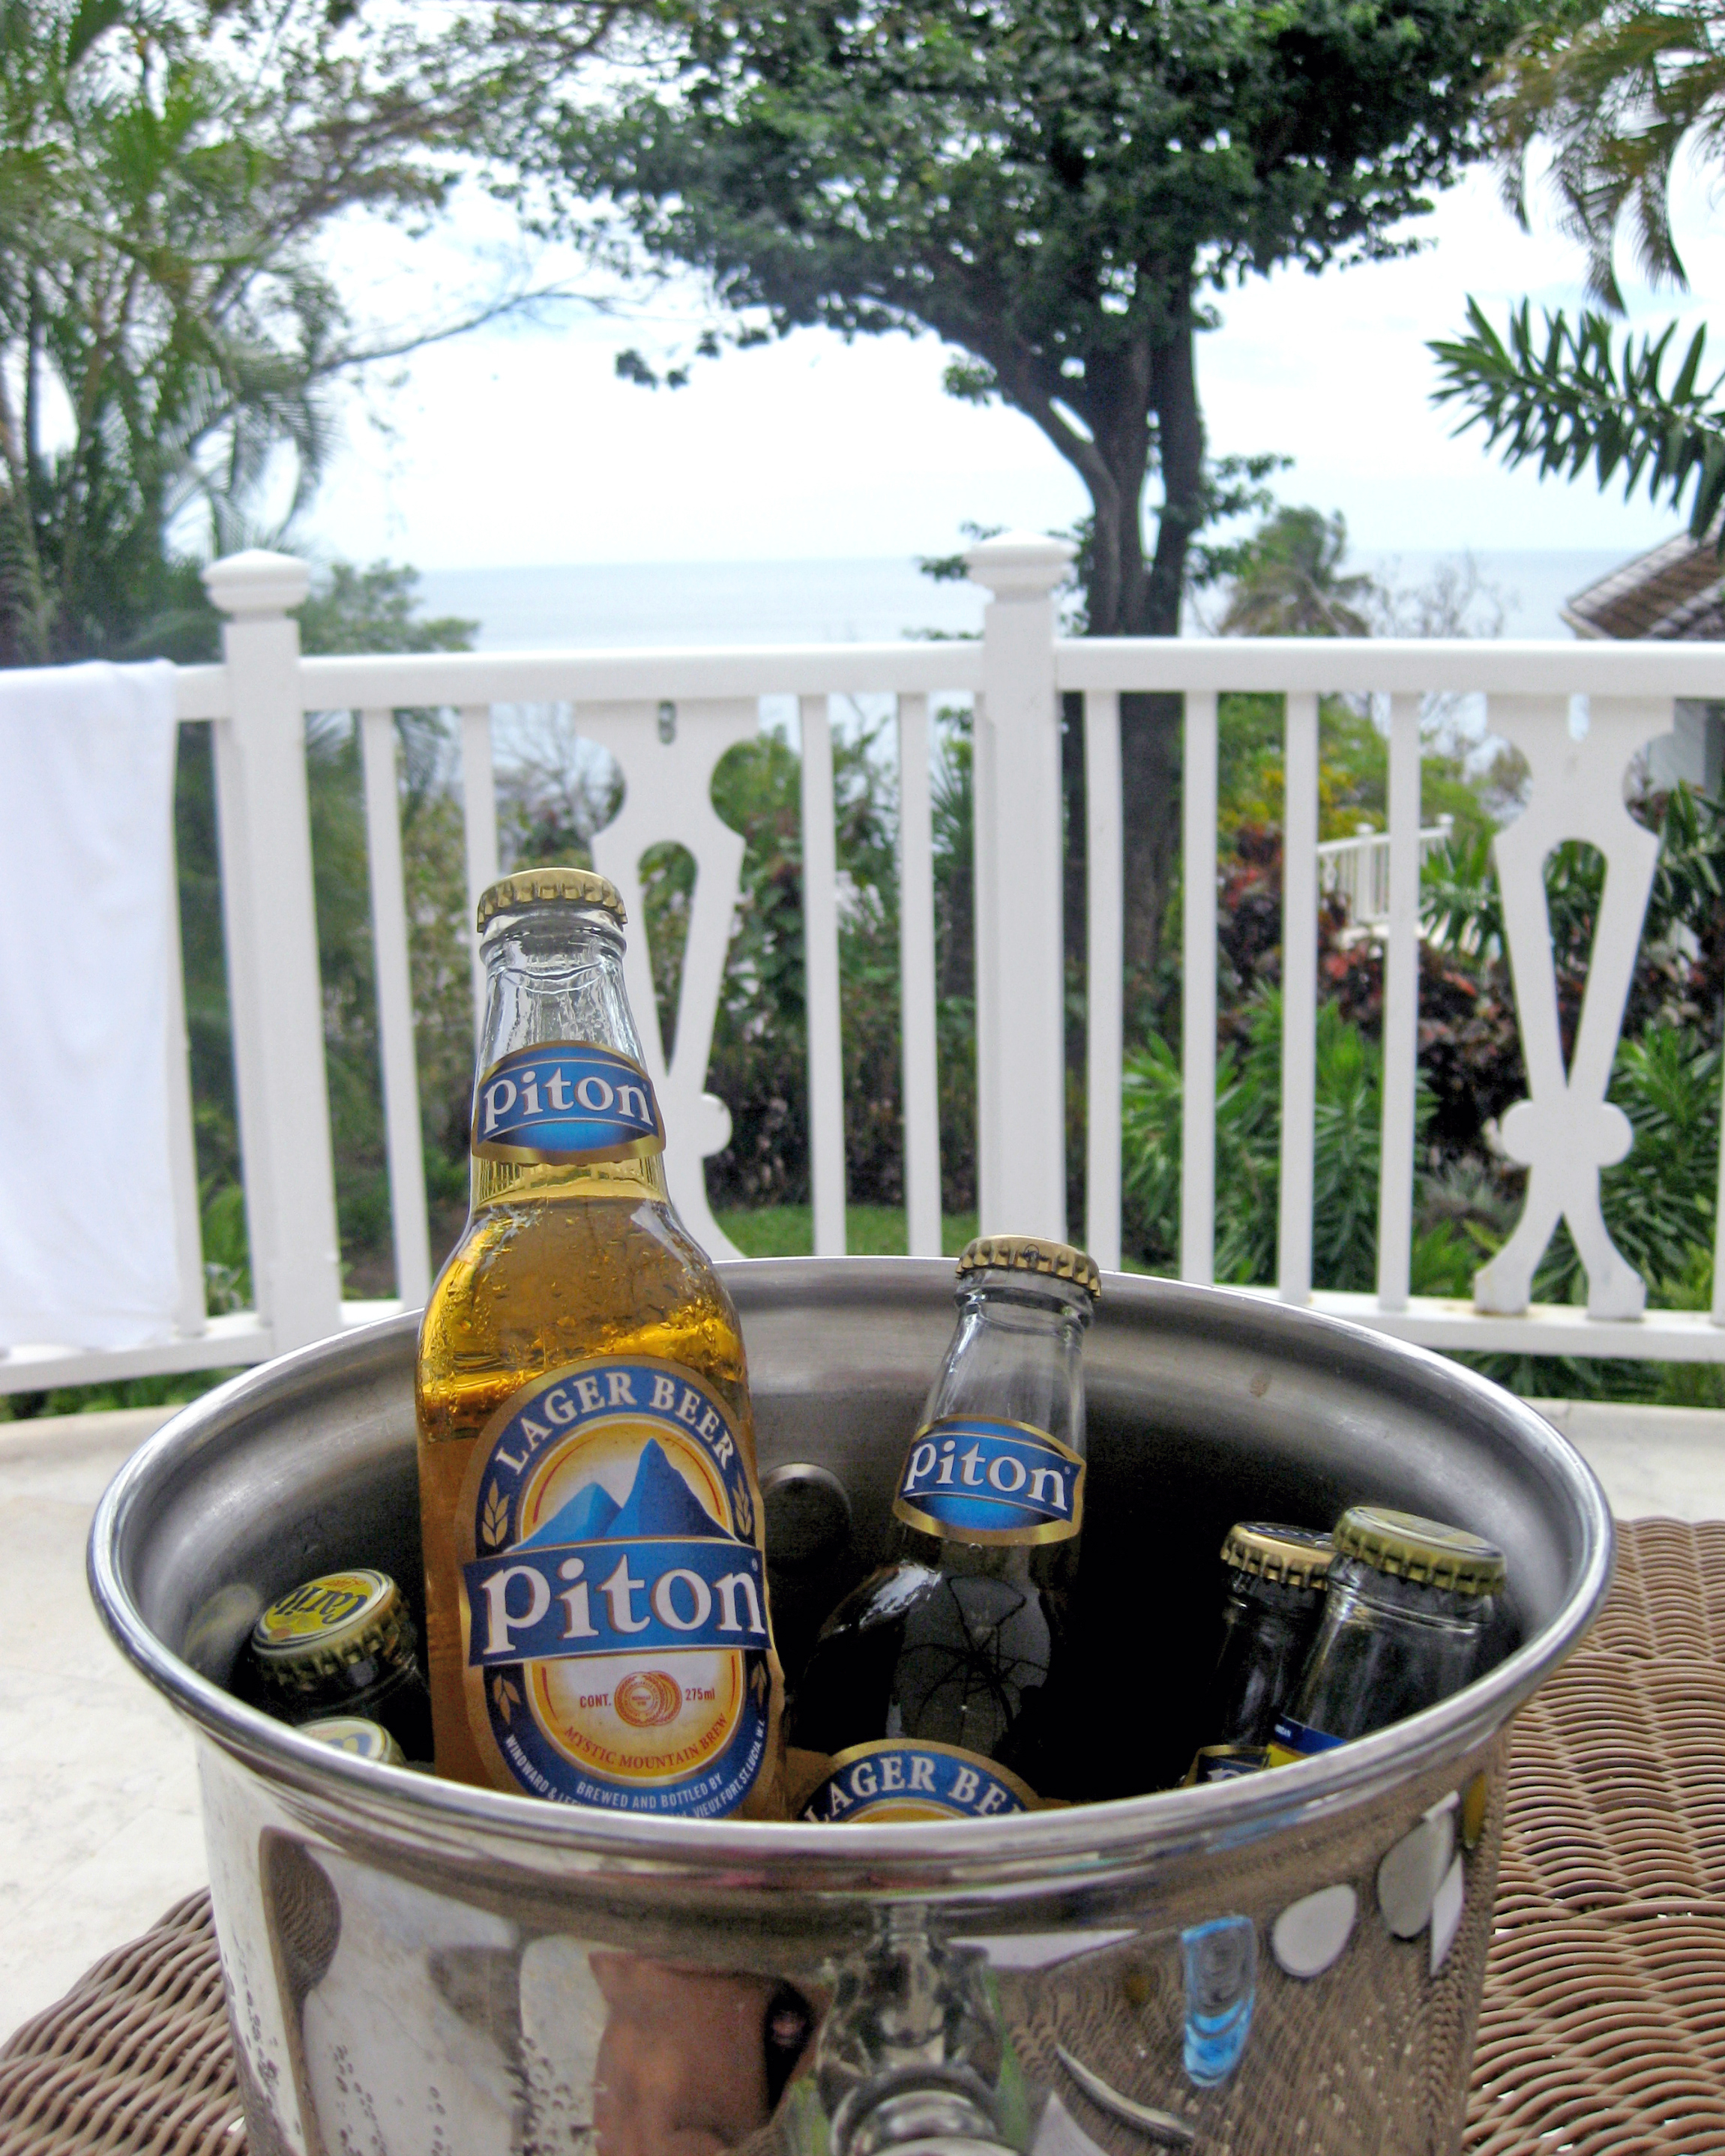 honeymoon-diary-st-lucia-lindsey-scott-piton-beer-wds110664-img-1640-1114.jpg